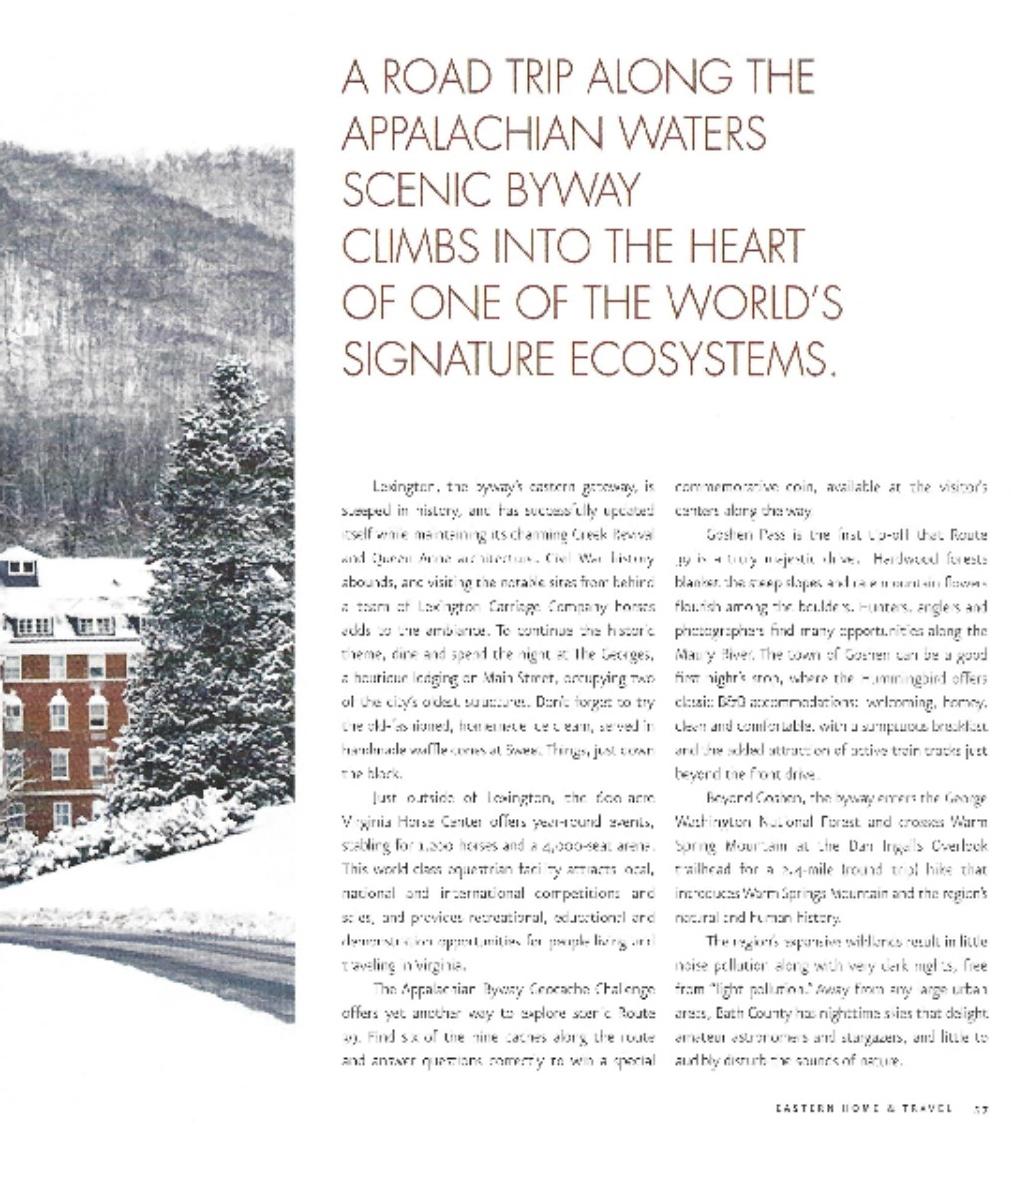 Along the Appalachian Waters Scenic Byway